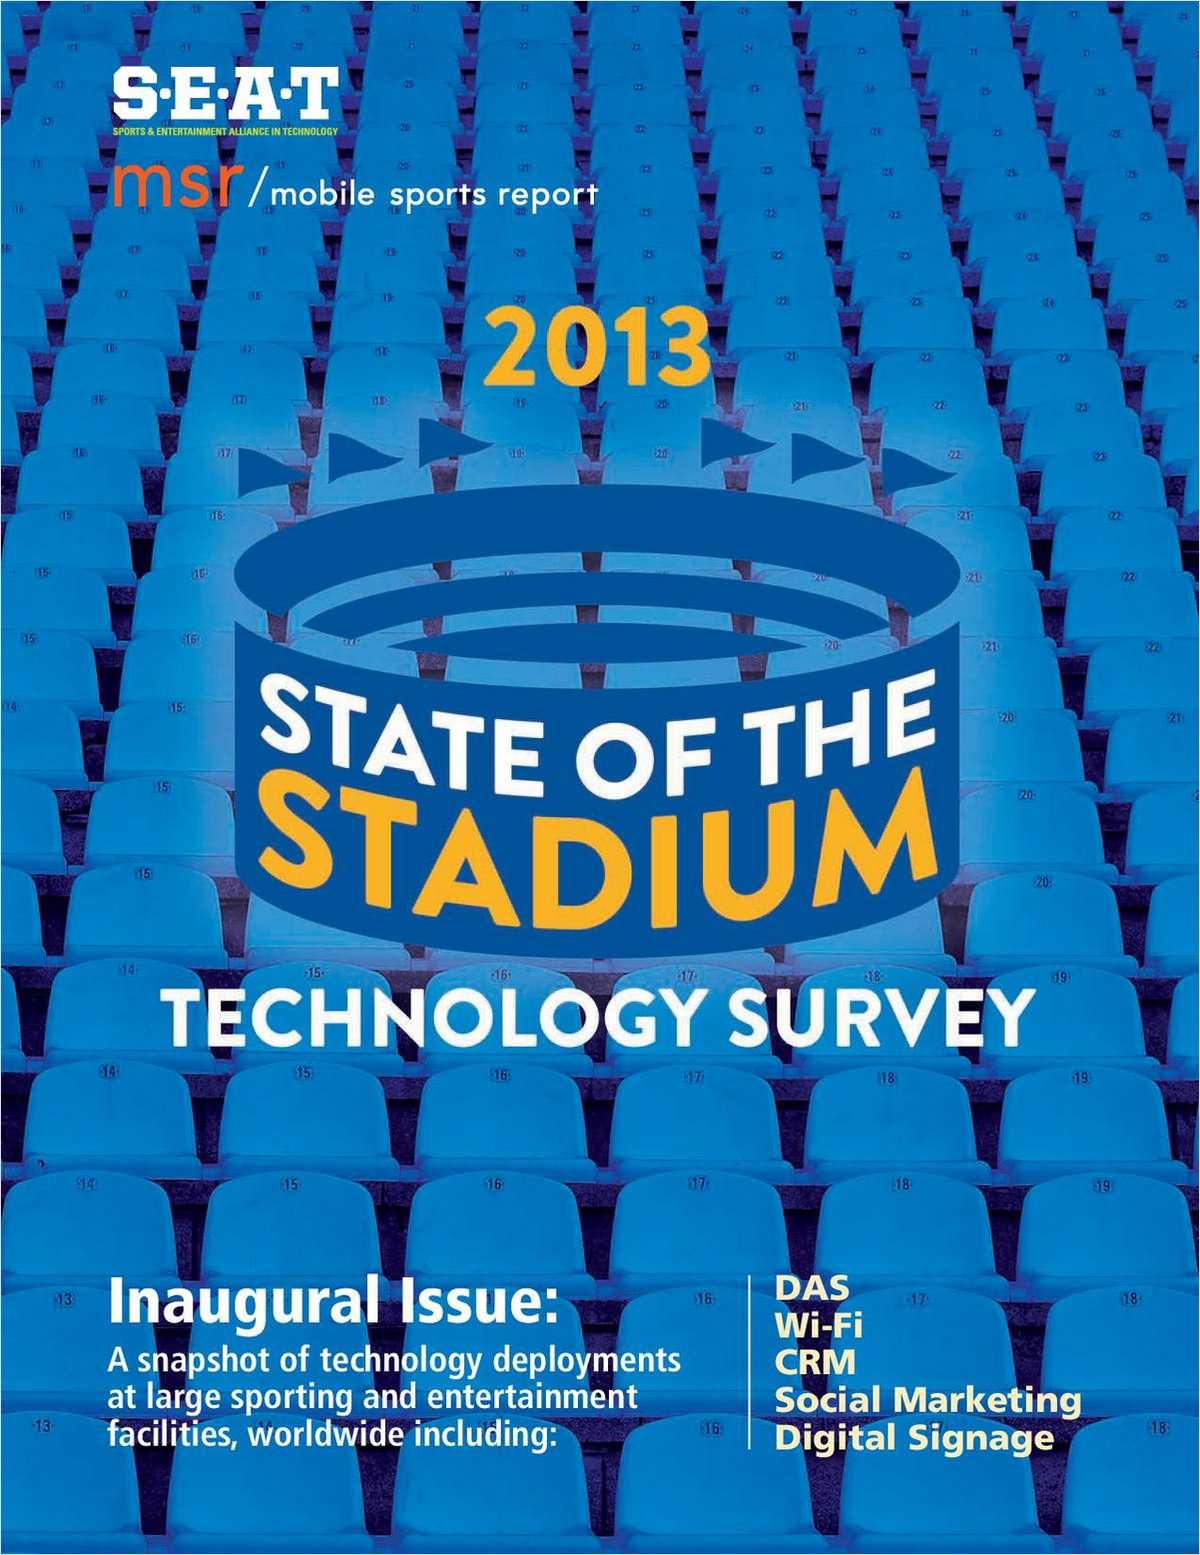 State of the Stadium